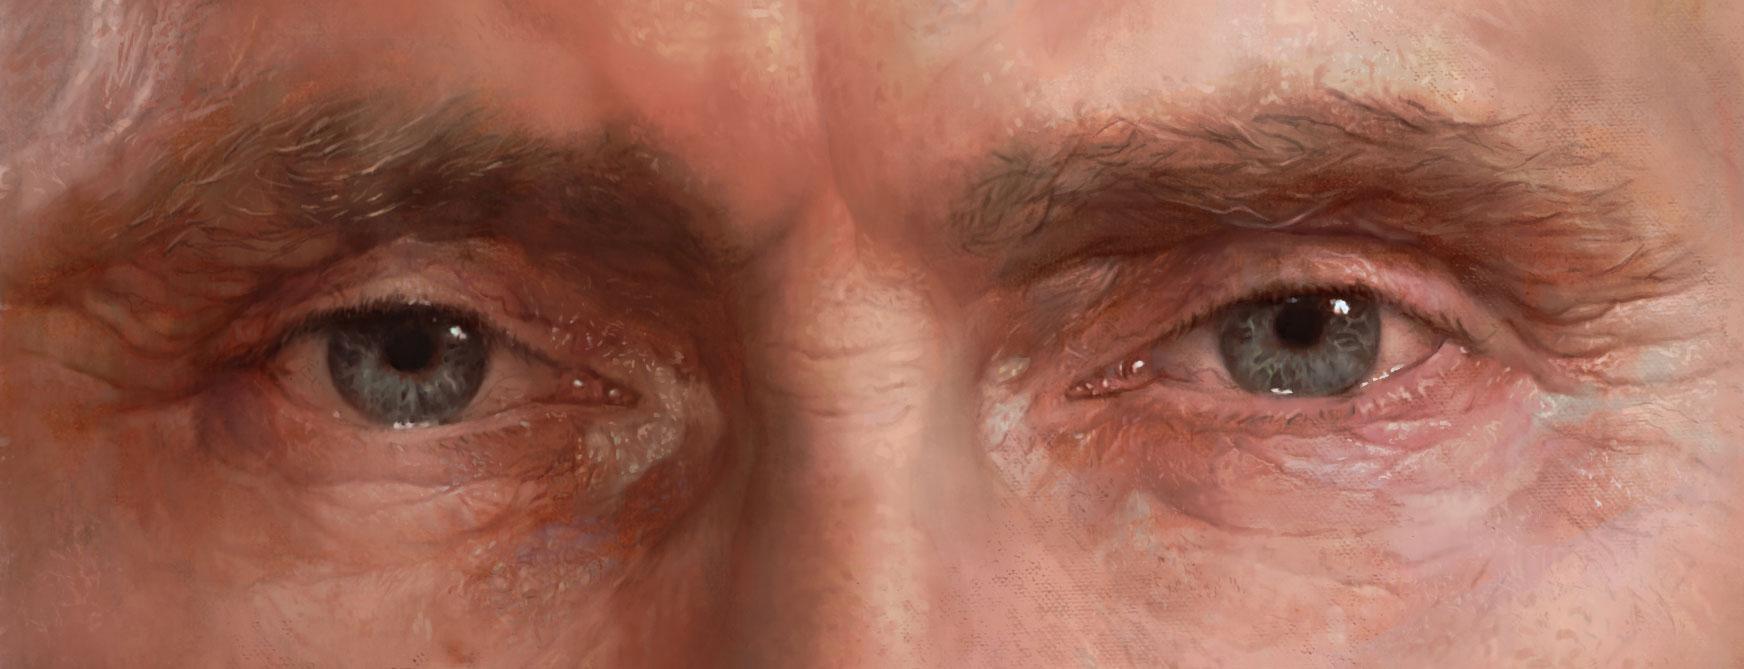 A detail from Sokov's portrait of Vladimir Putin.